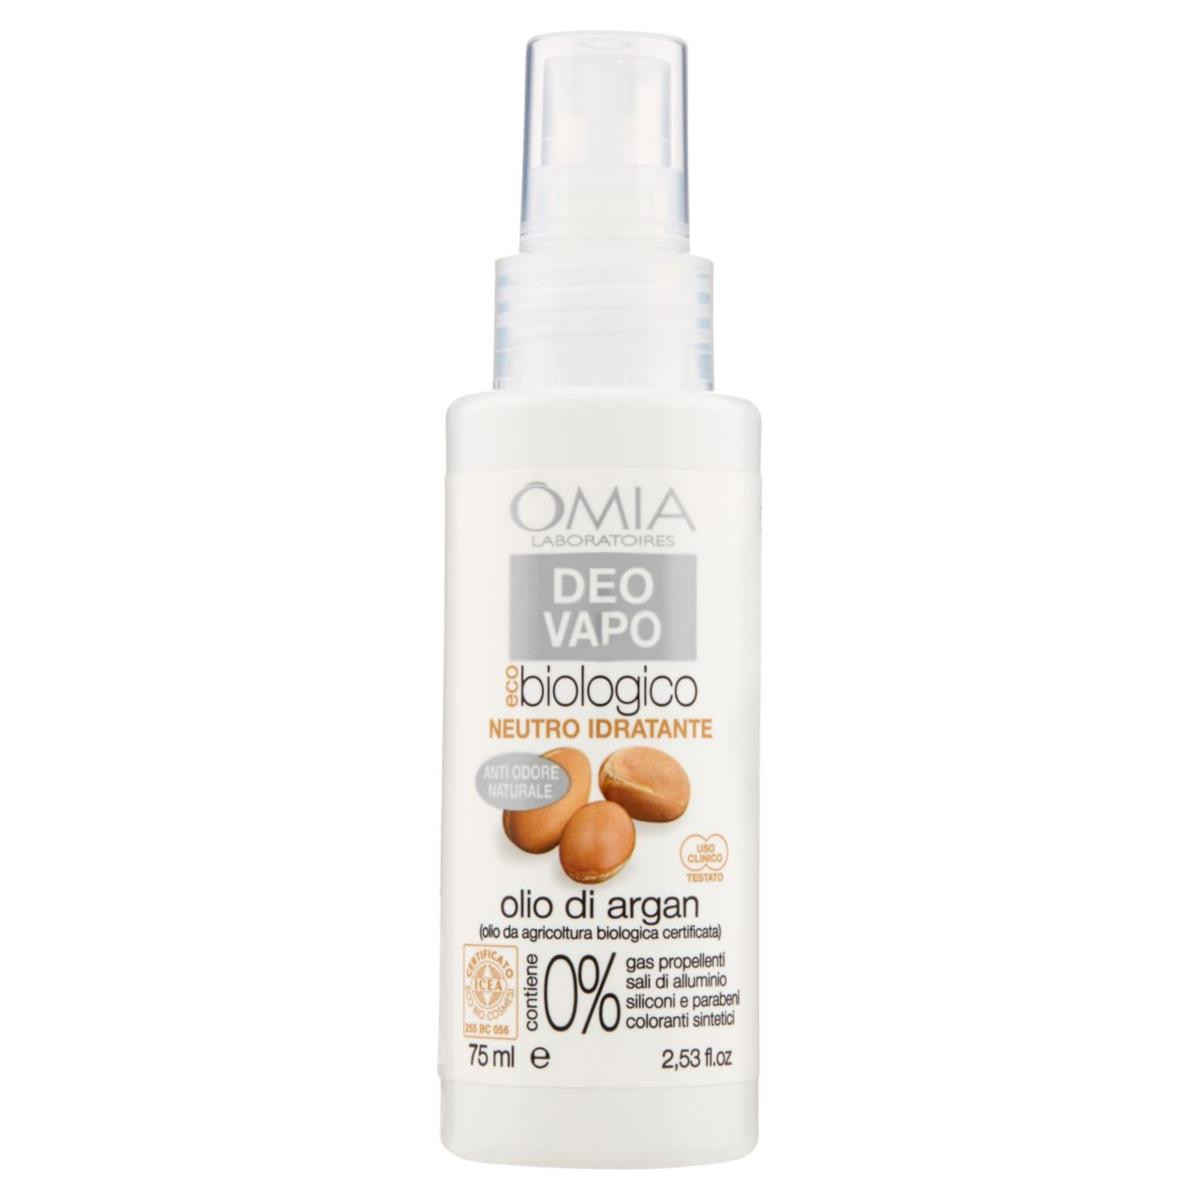 OMIA Deodorante Vapo Eco-biologico Neutro Idratante olio di argan 75 ml